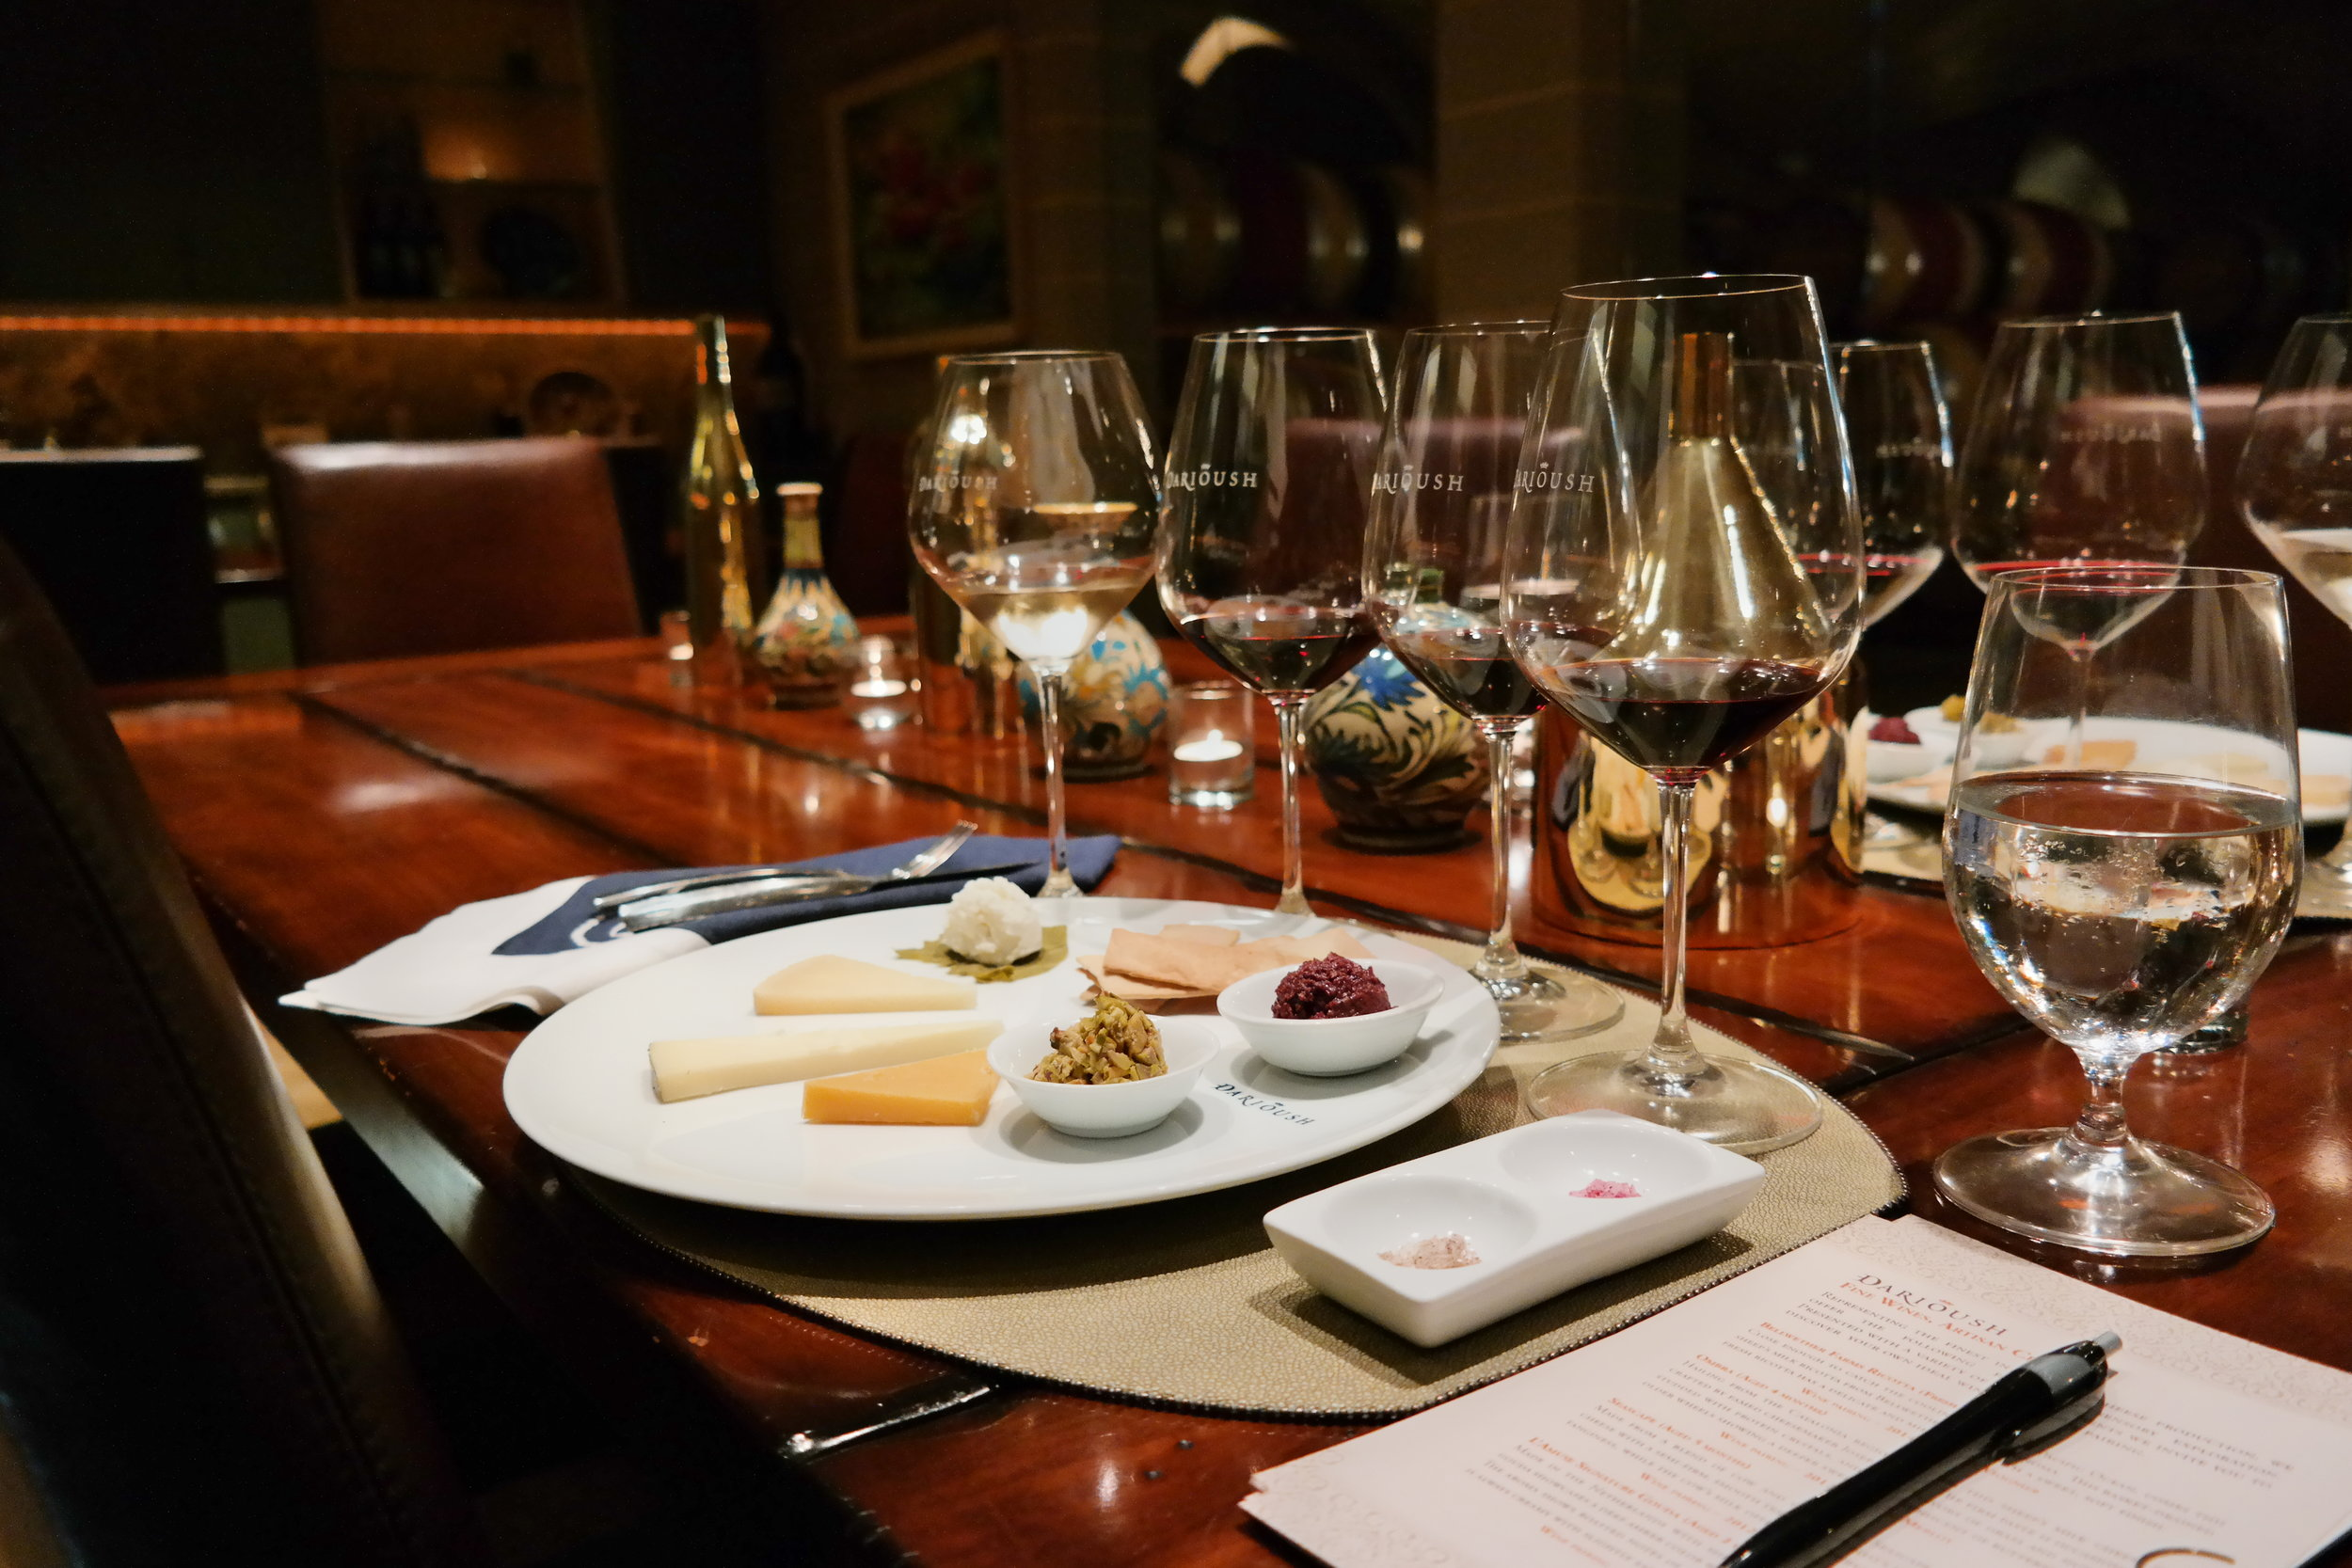 Darioush Wine and Cheese tasting worth a splurge!